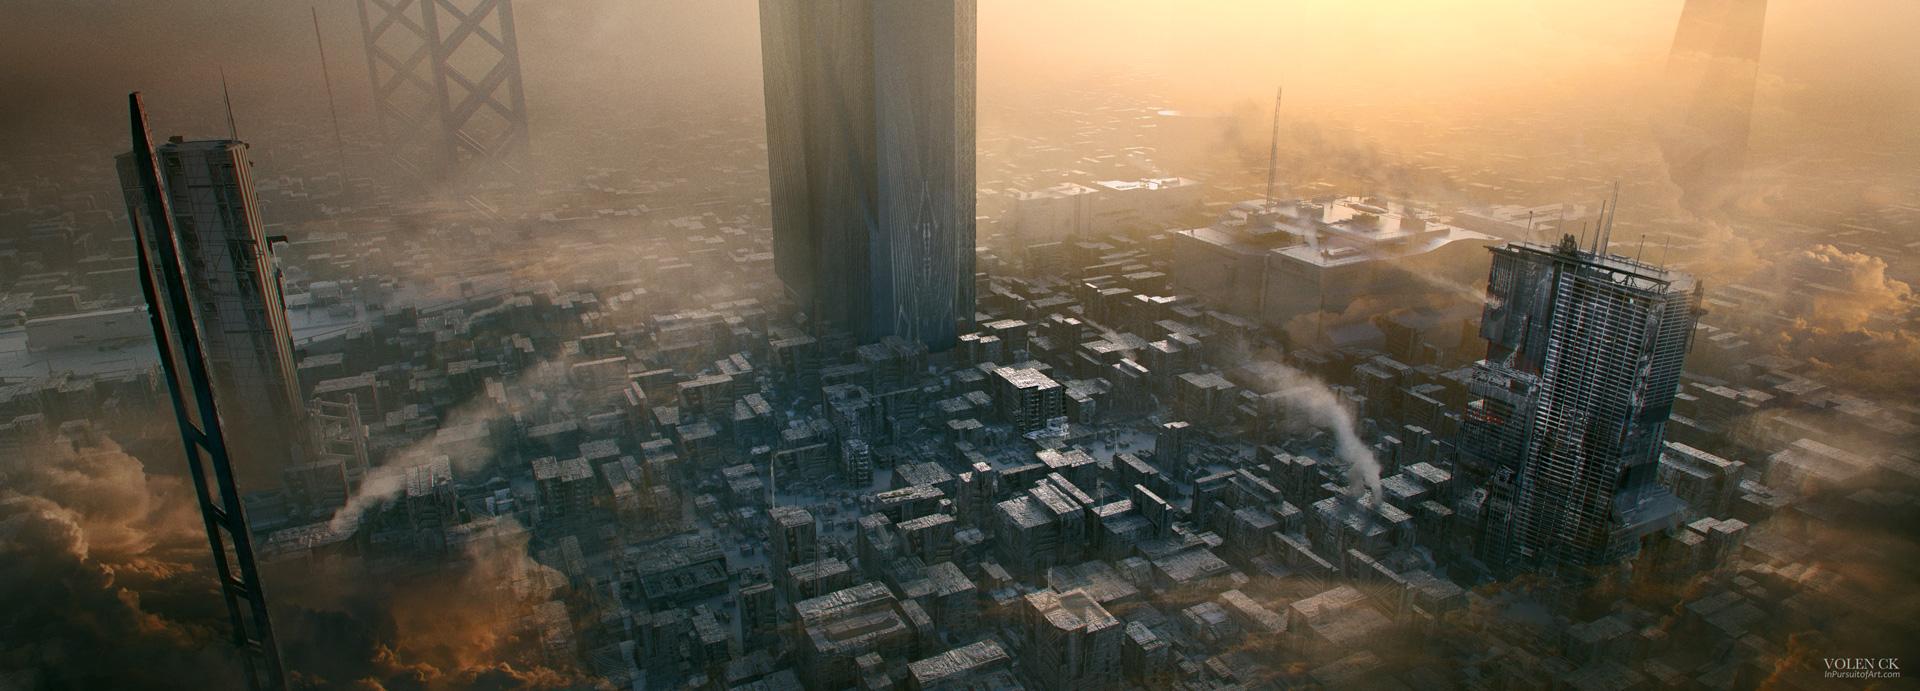 Sci-Fi-Industrial-City---Cityscape-Volen-InPursuitOfArt